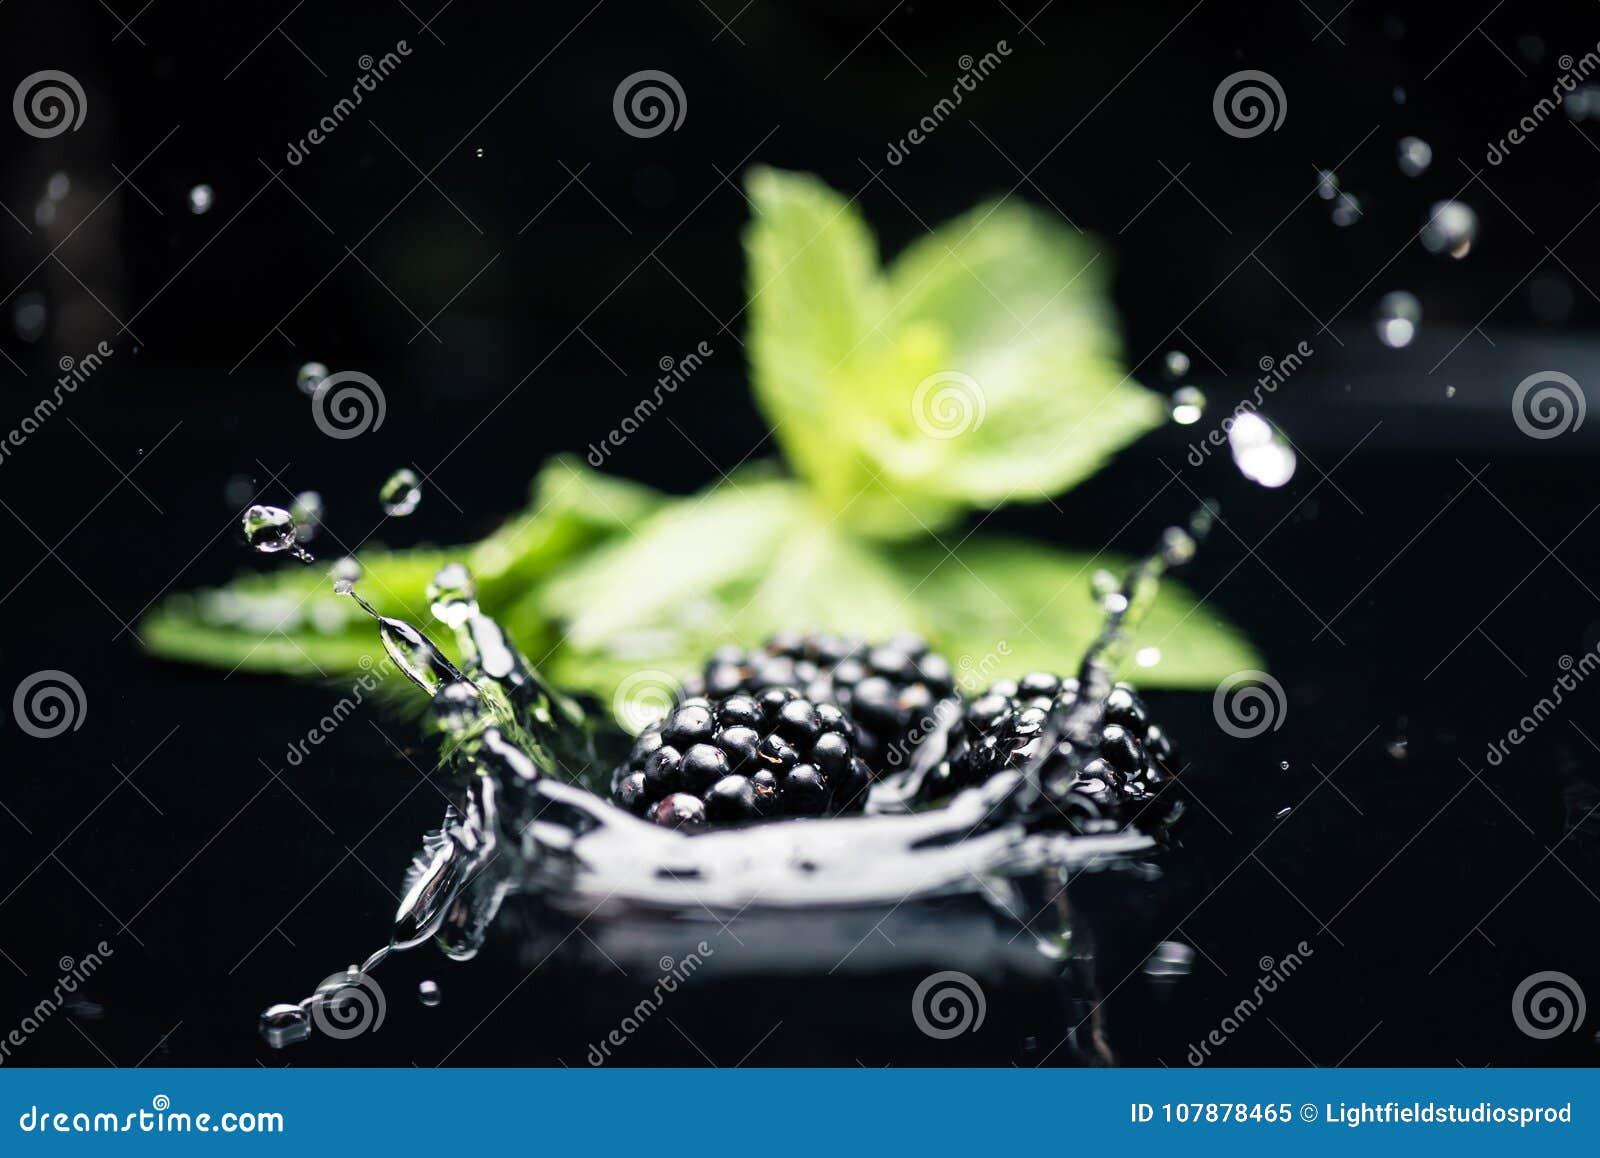 ripe blackberries falling in water